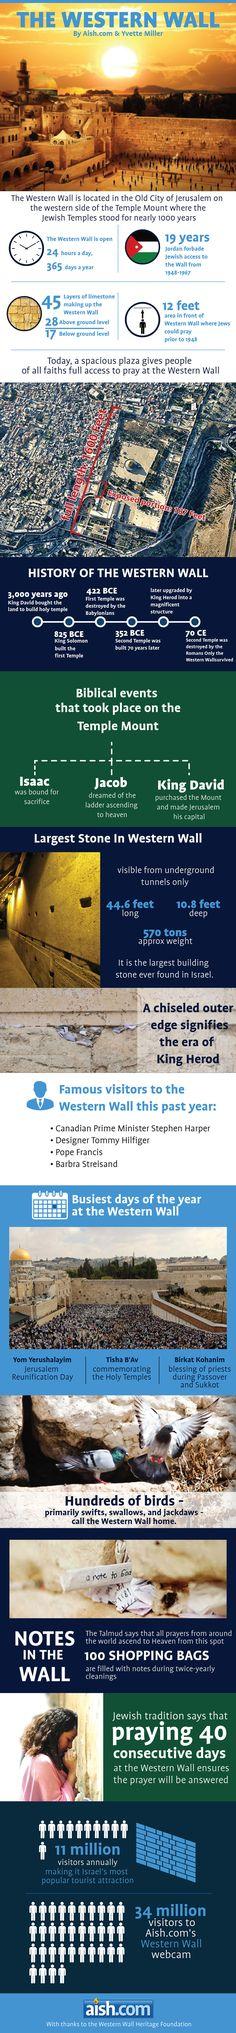 The Western Wall Information #Israel #Jerusalem #Kotel